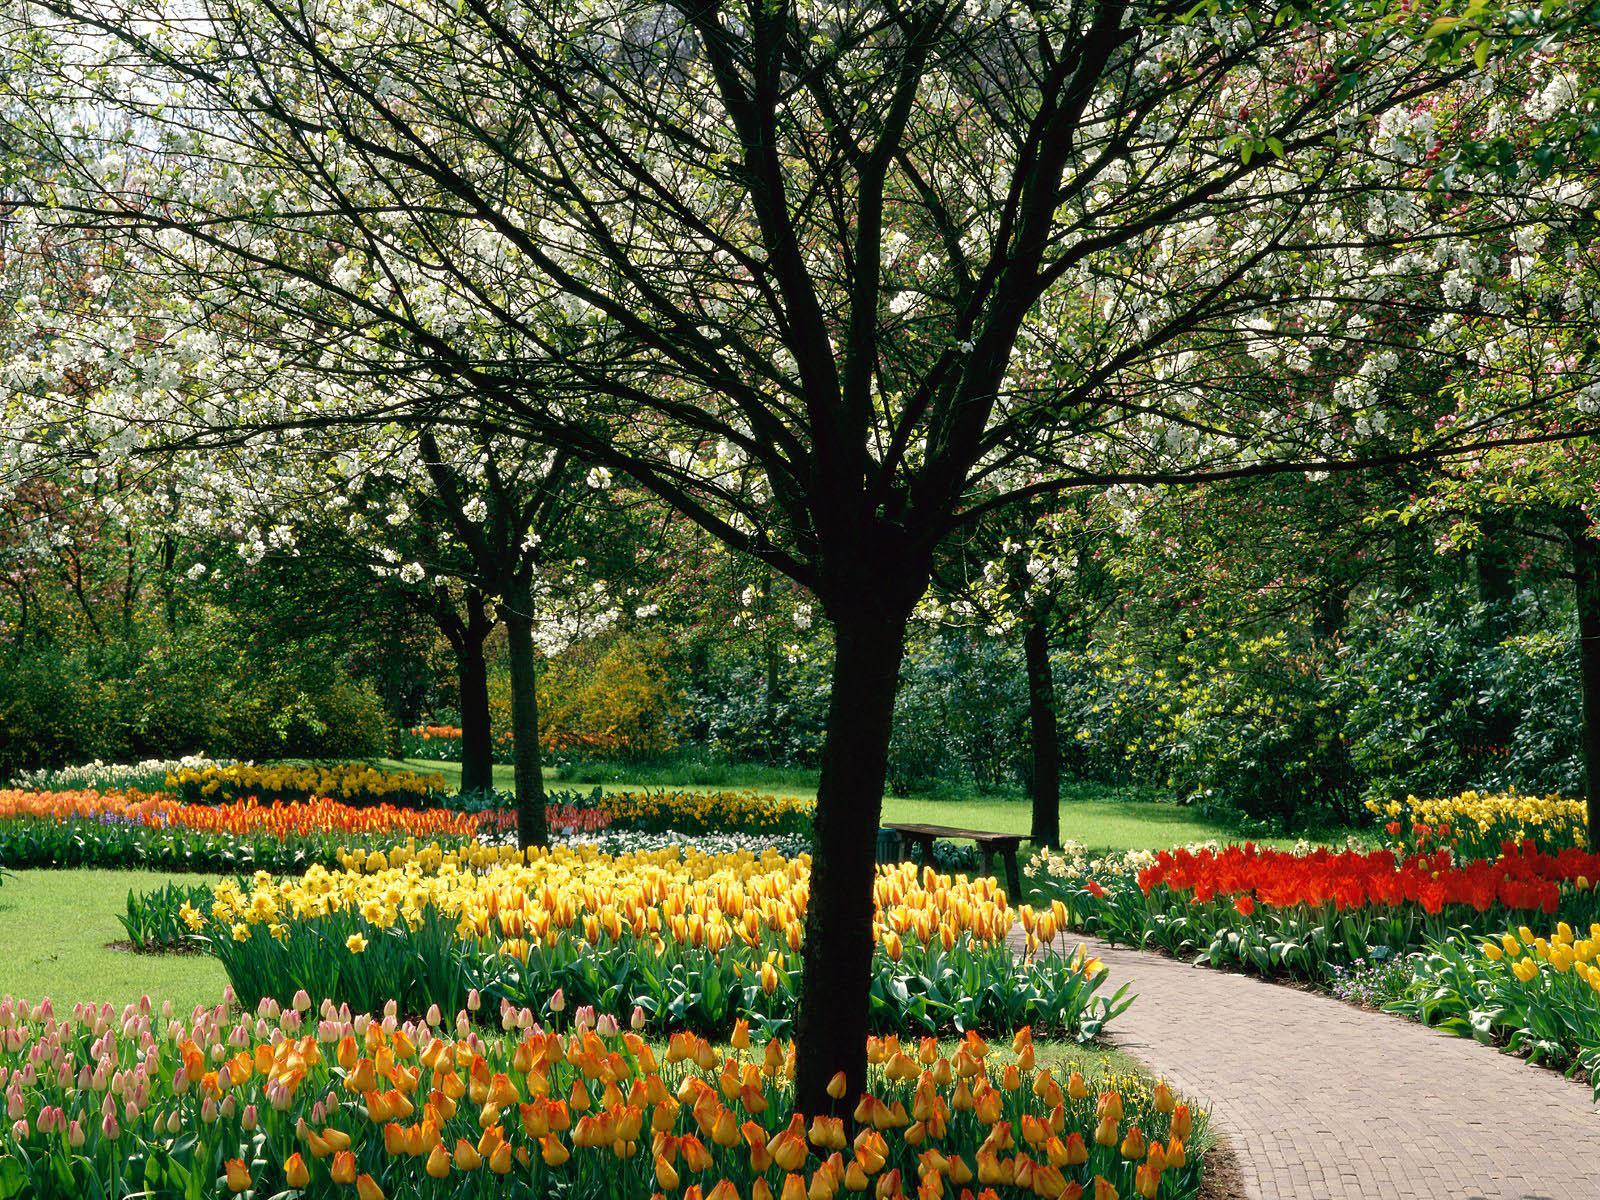 spring wallpapers spring desktop wallpapers spring desktop backgrounds 1600x1200